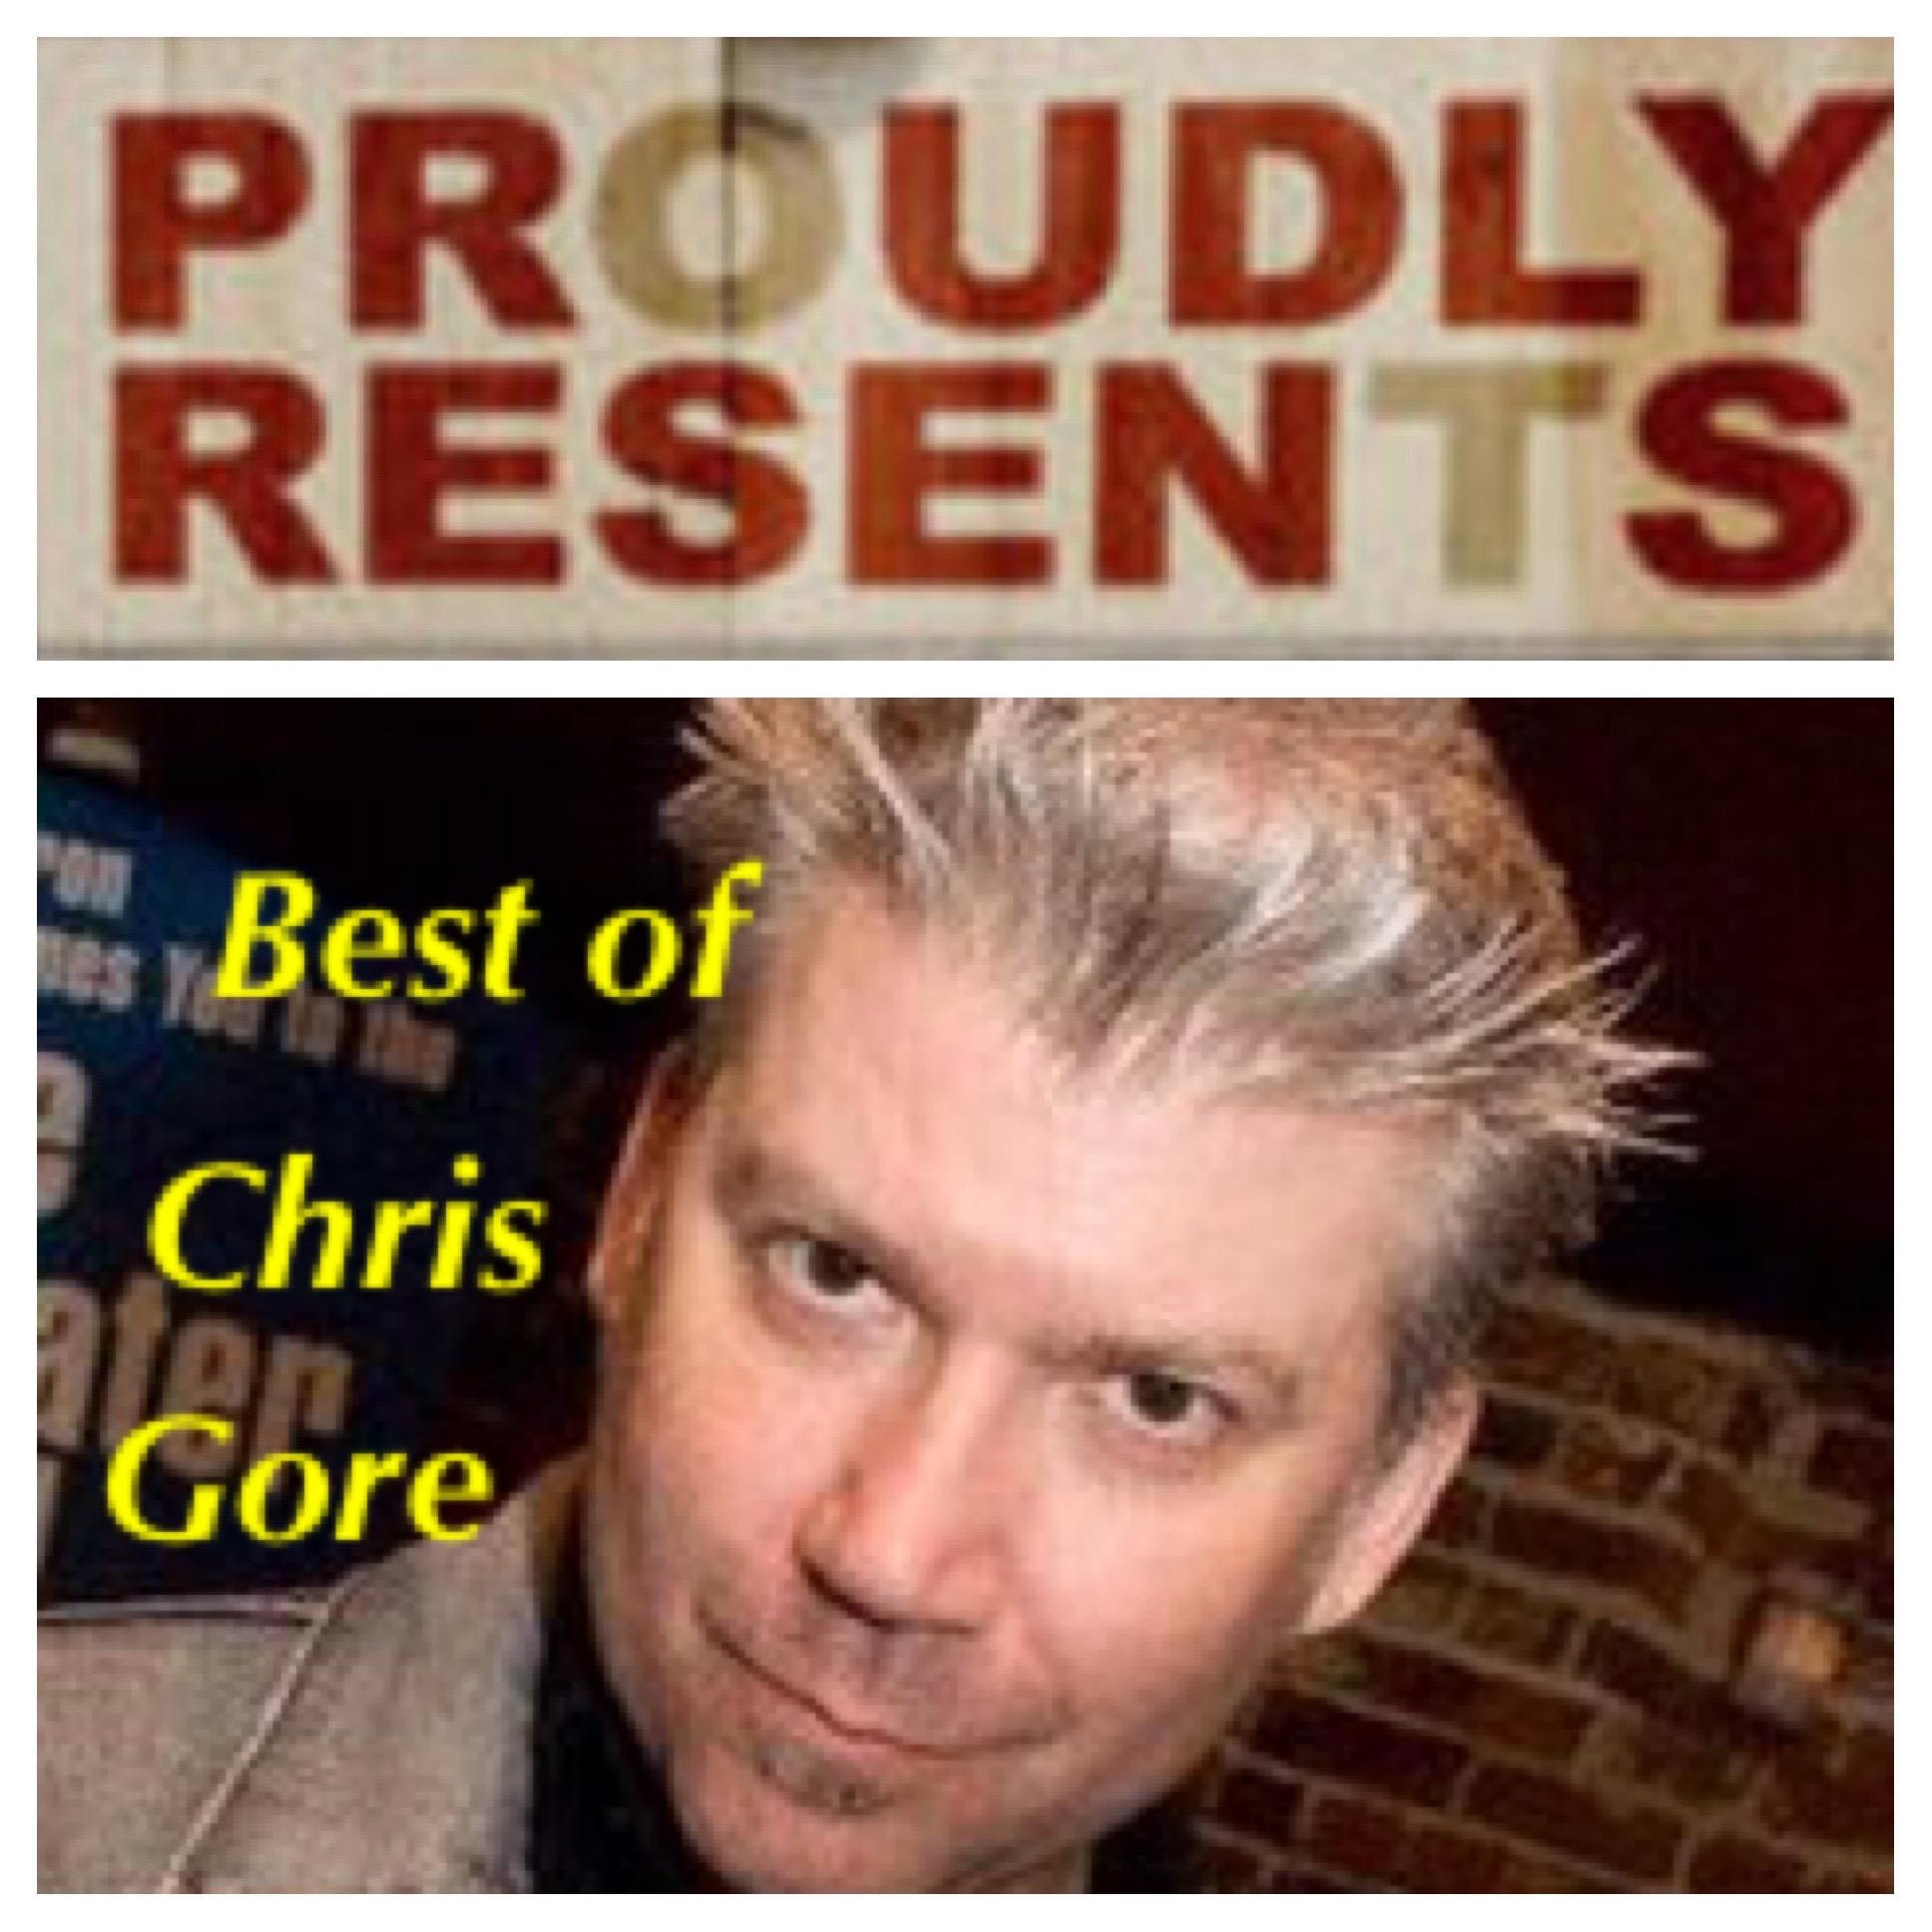 Chris Gore